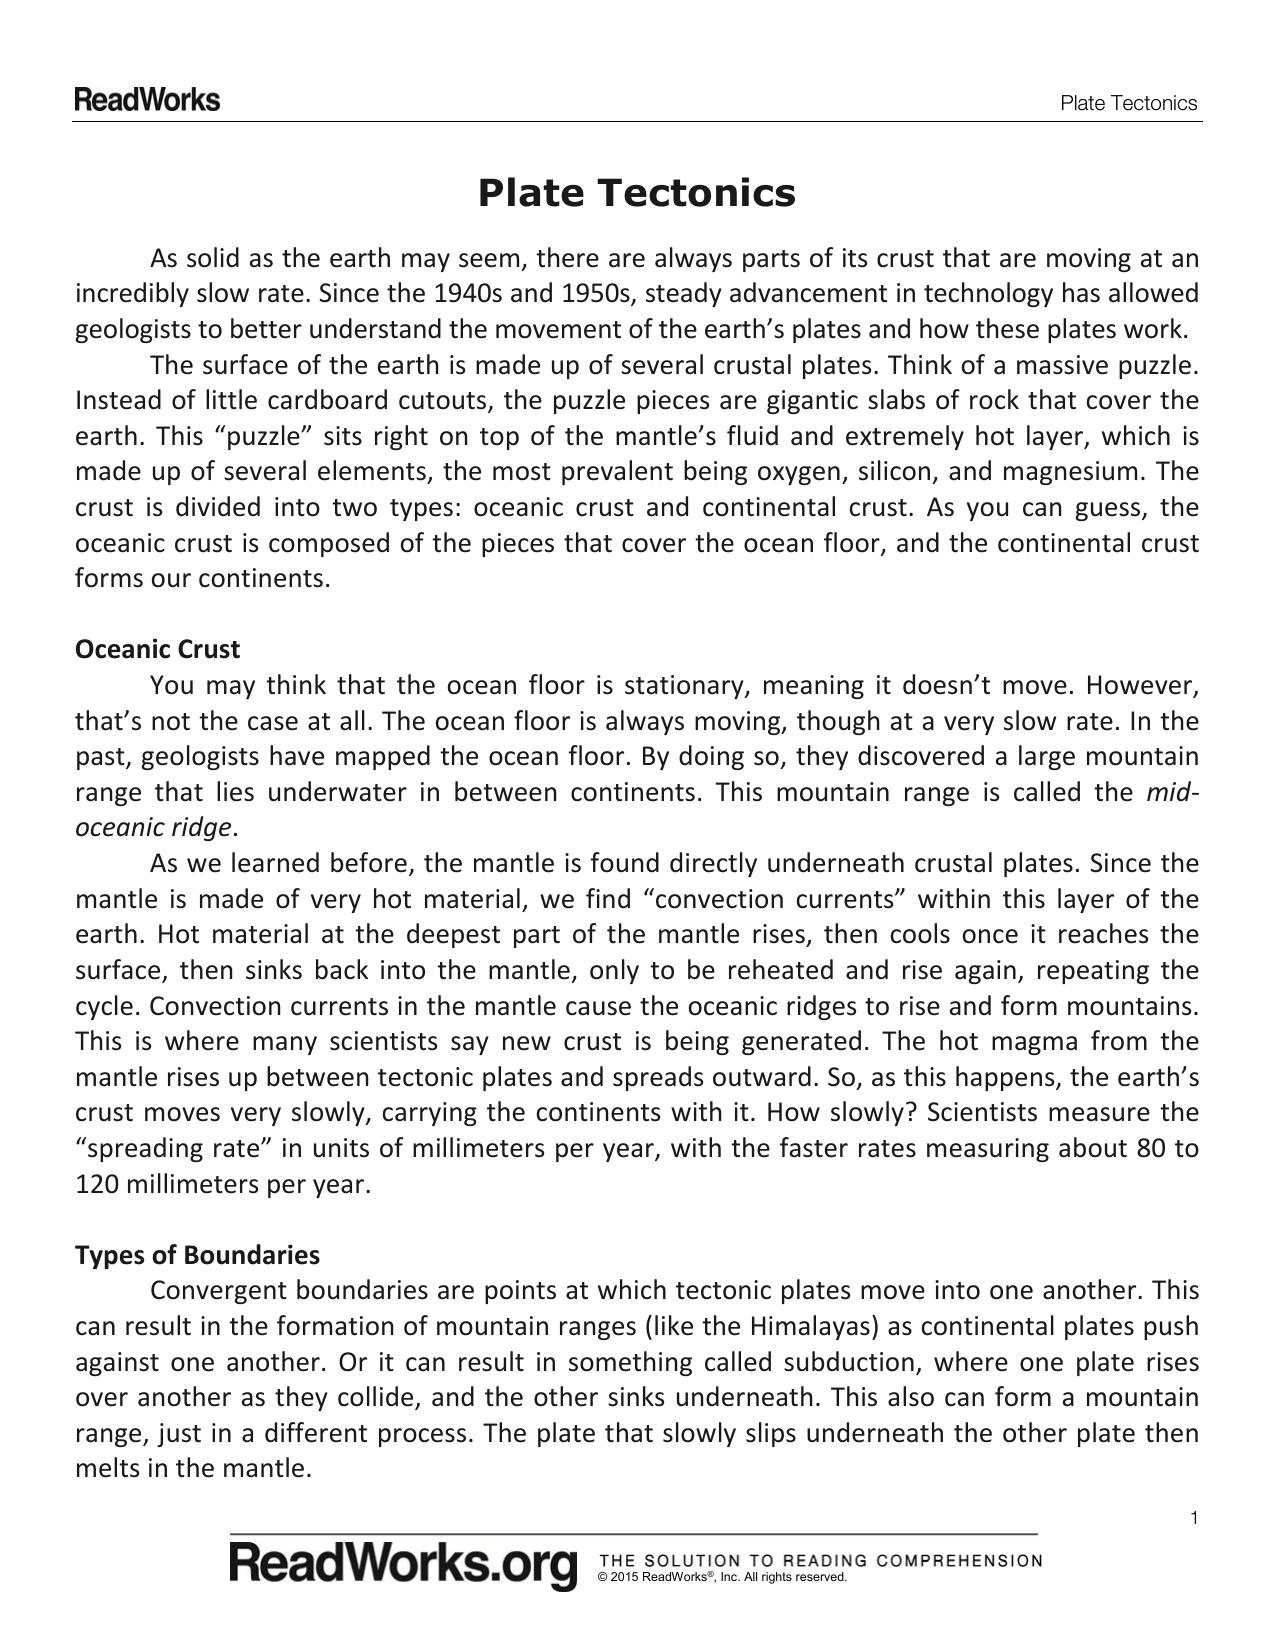 - Plate Tectonics Reading Passage